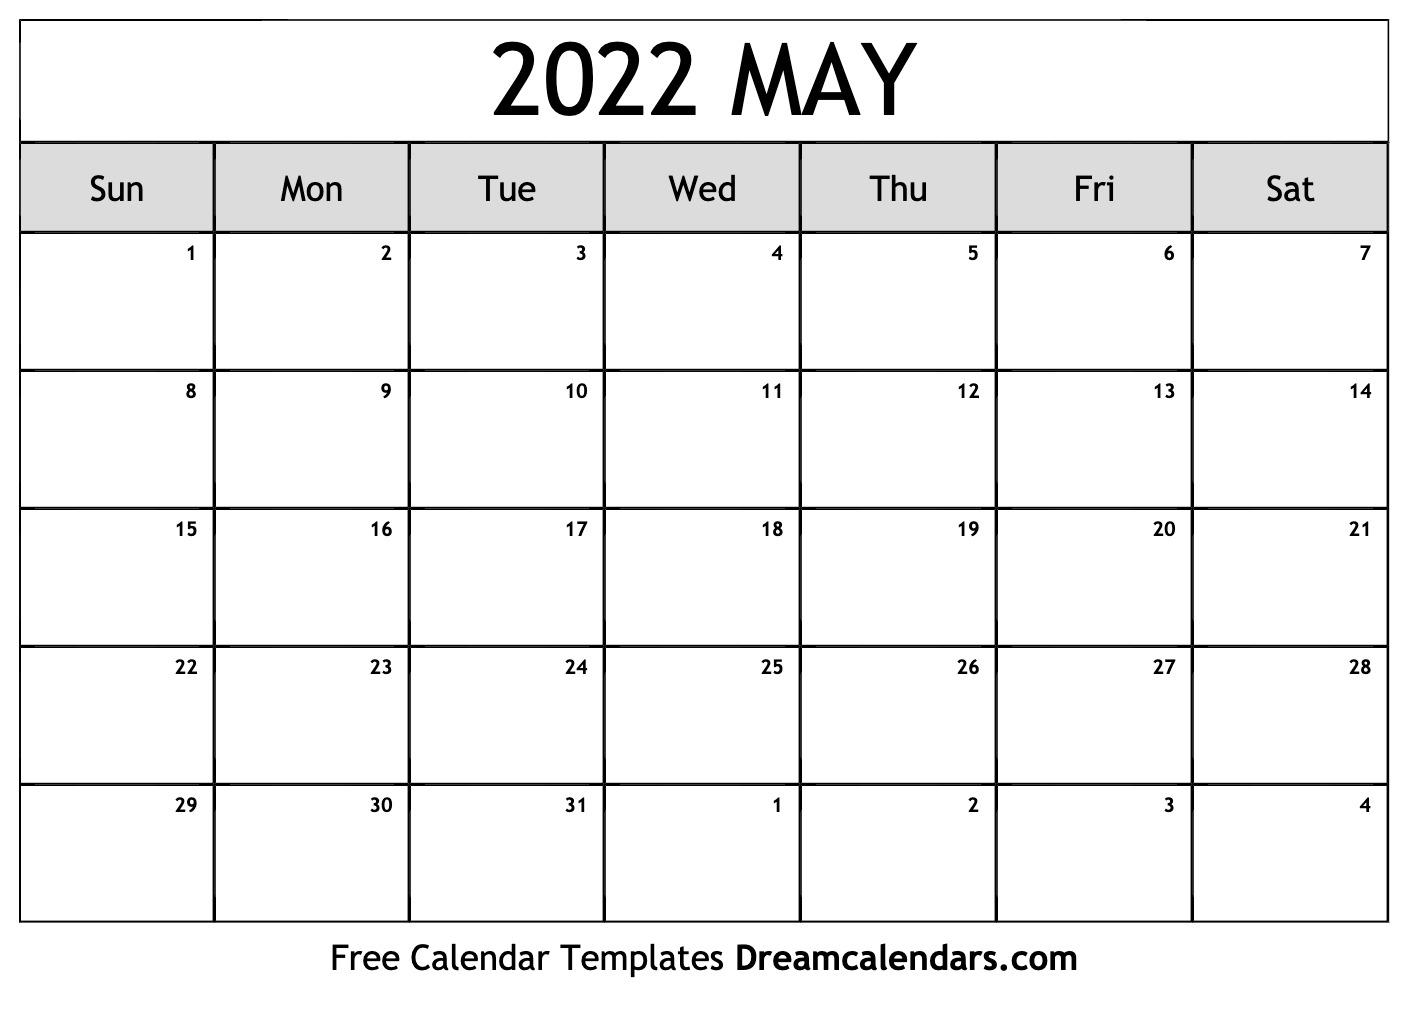 Blank Calendar For May 2022.May 2022 Calendar Free Blank Printable Templates